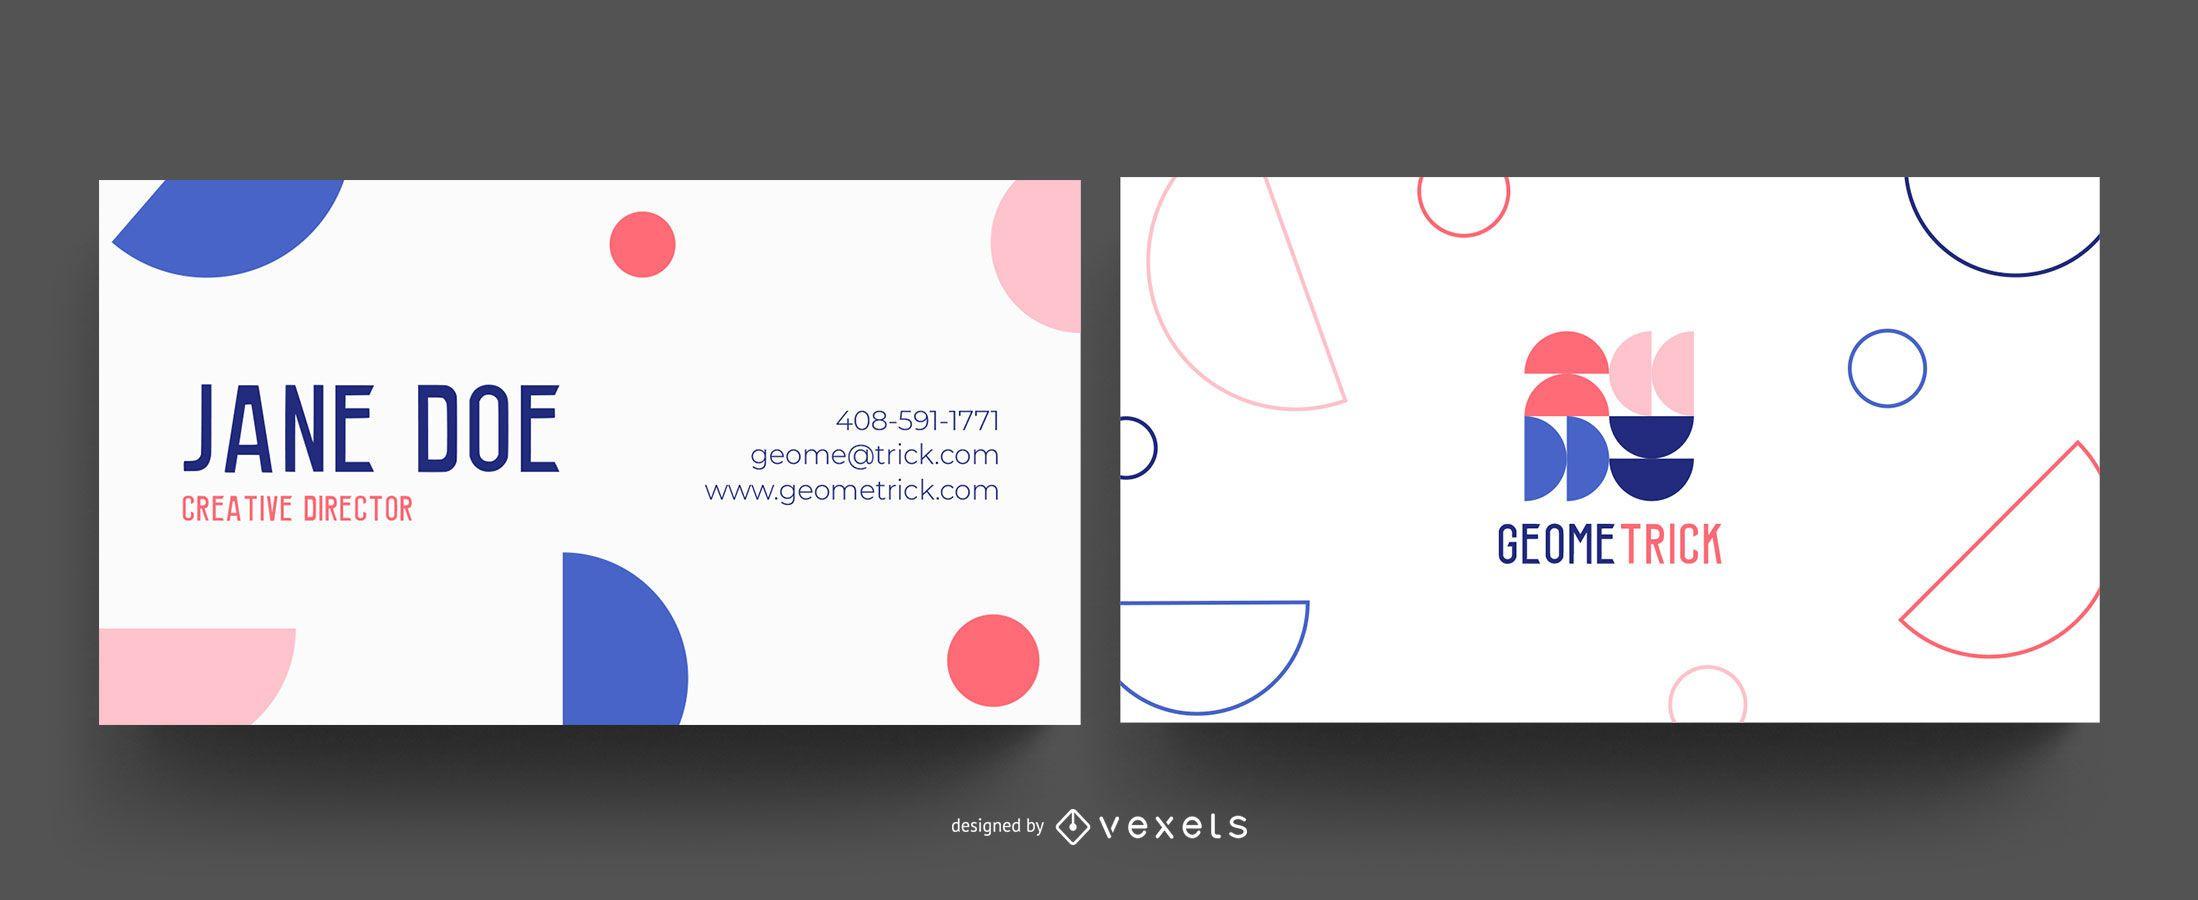 Geometric shapes business card